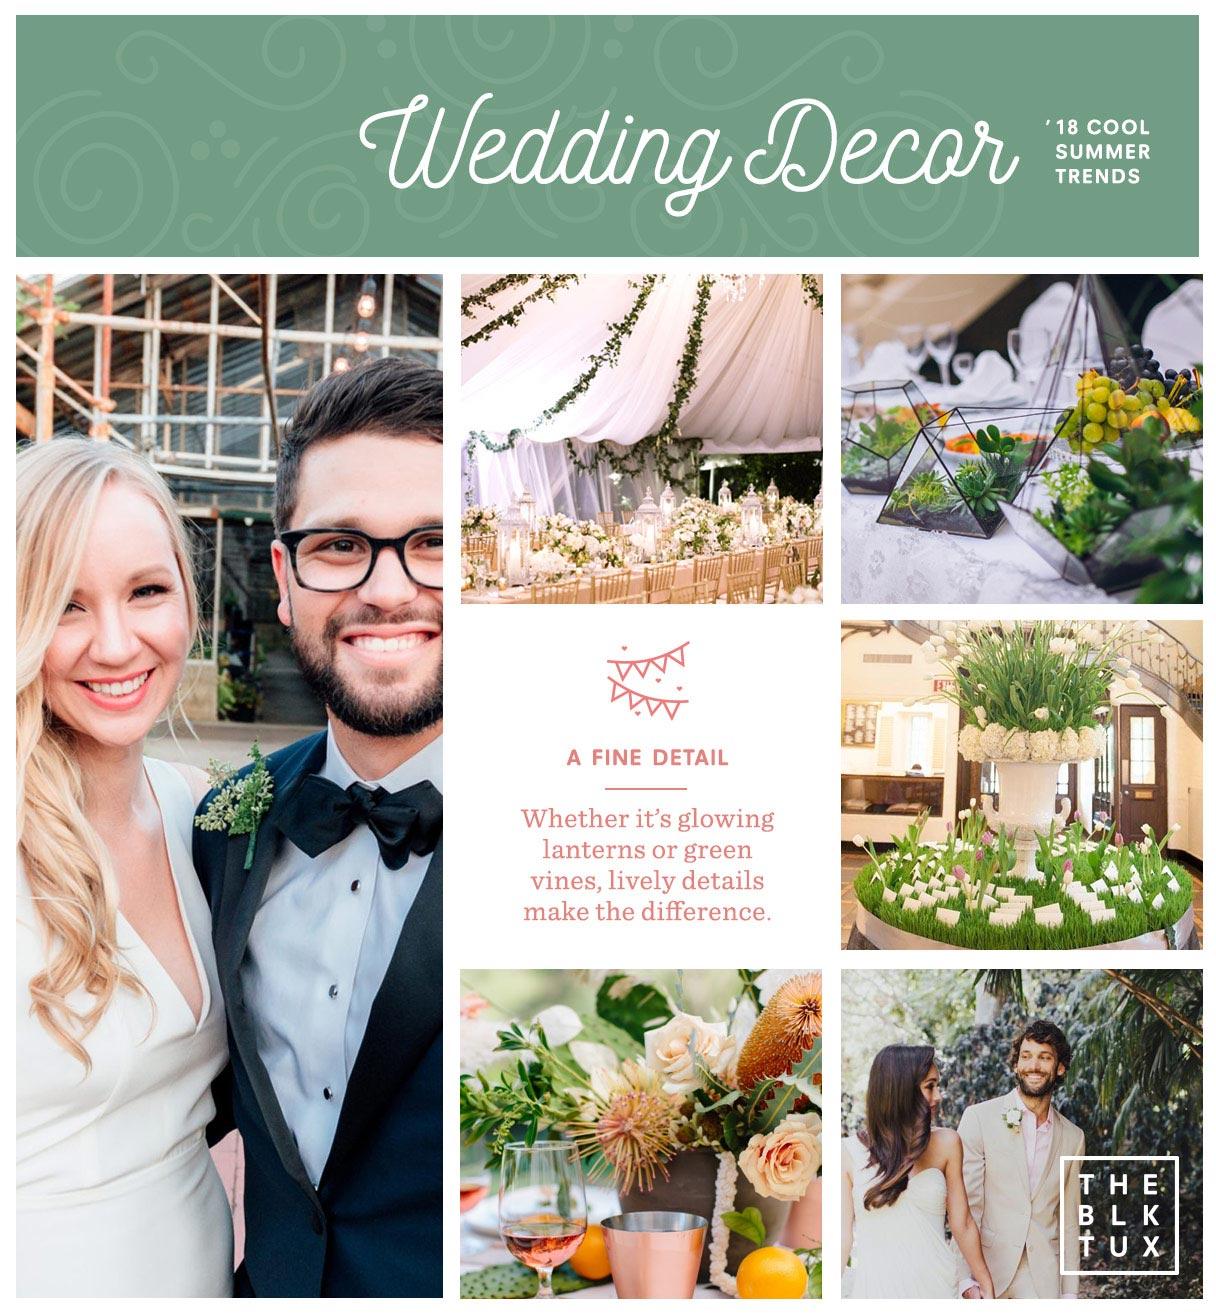 Blacktrux_weddingtrends_decor_v02.jpg